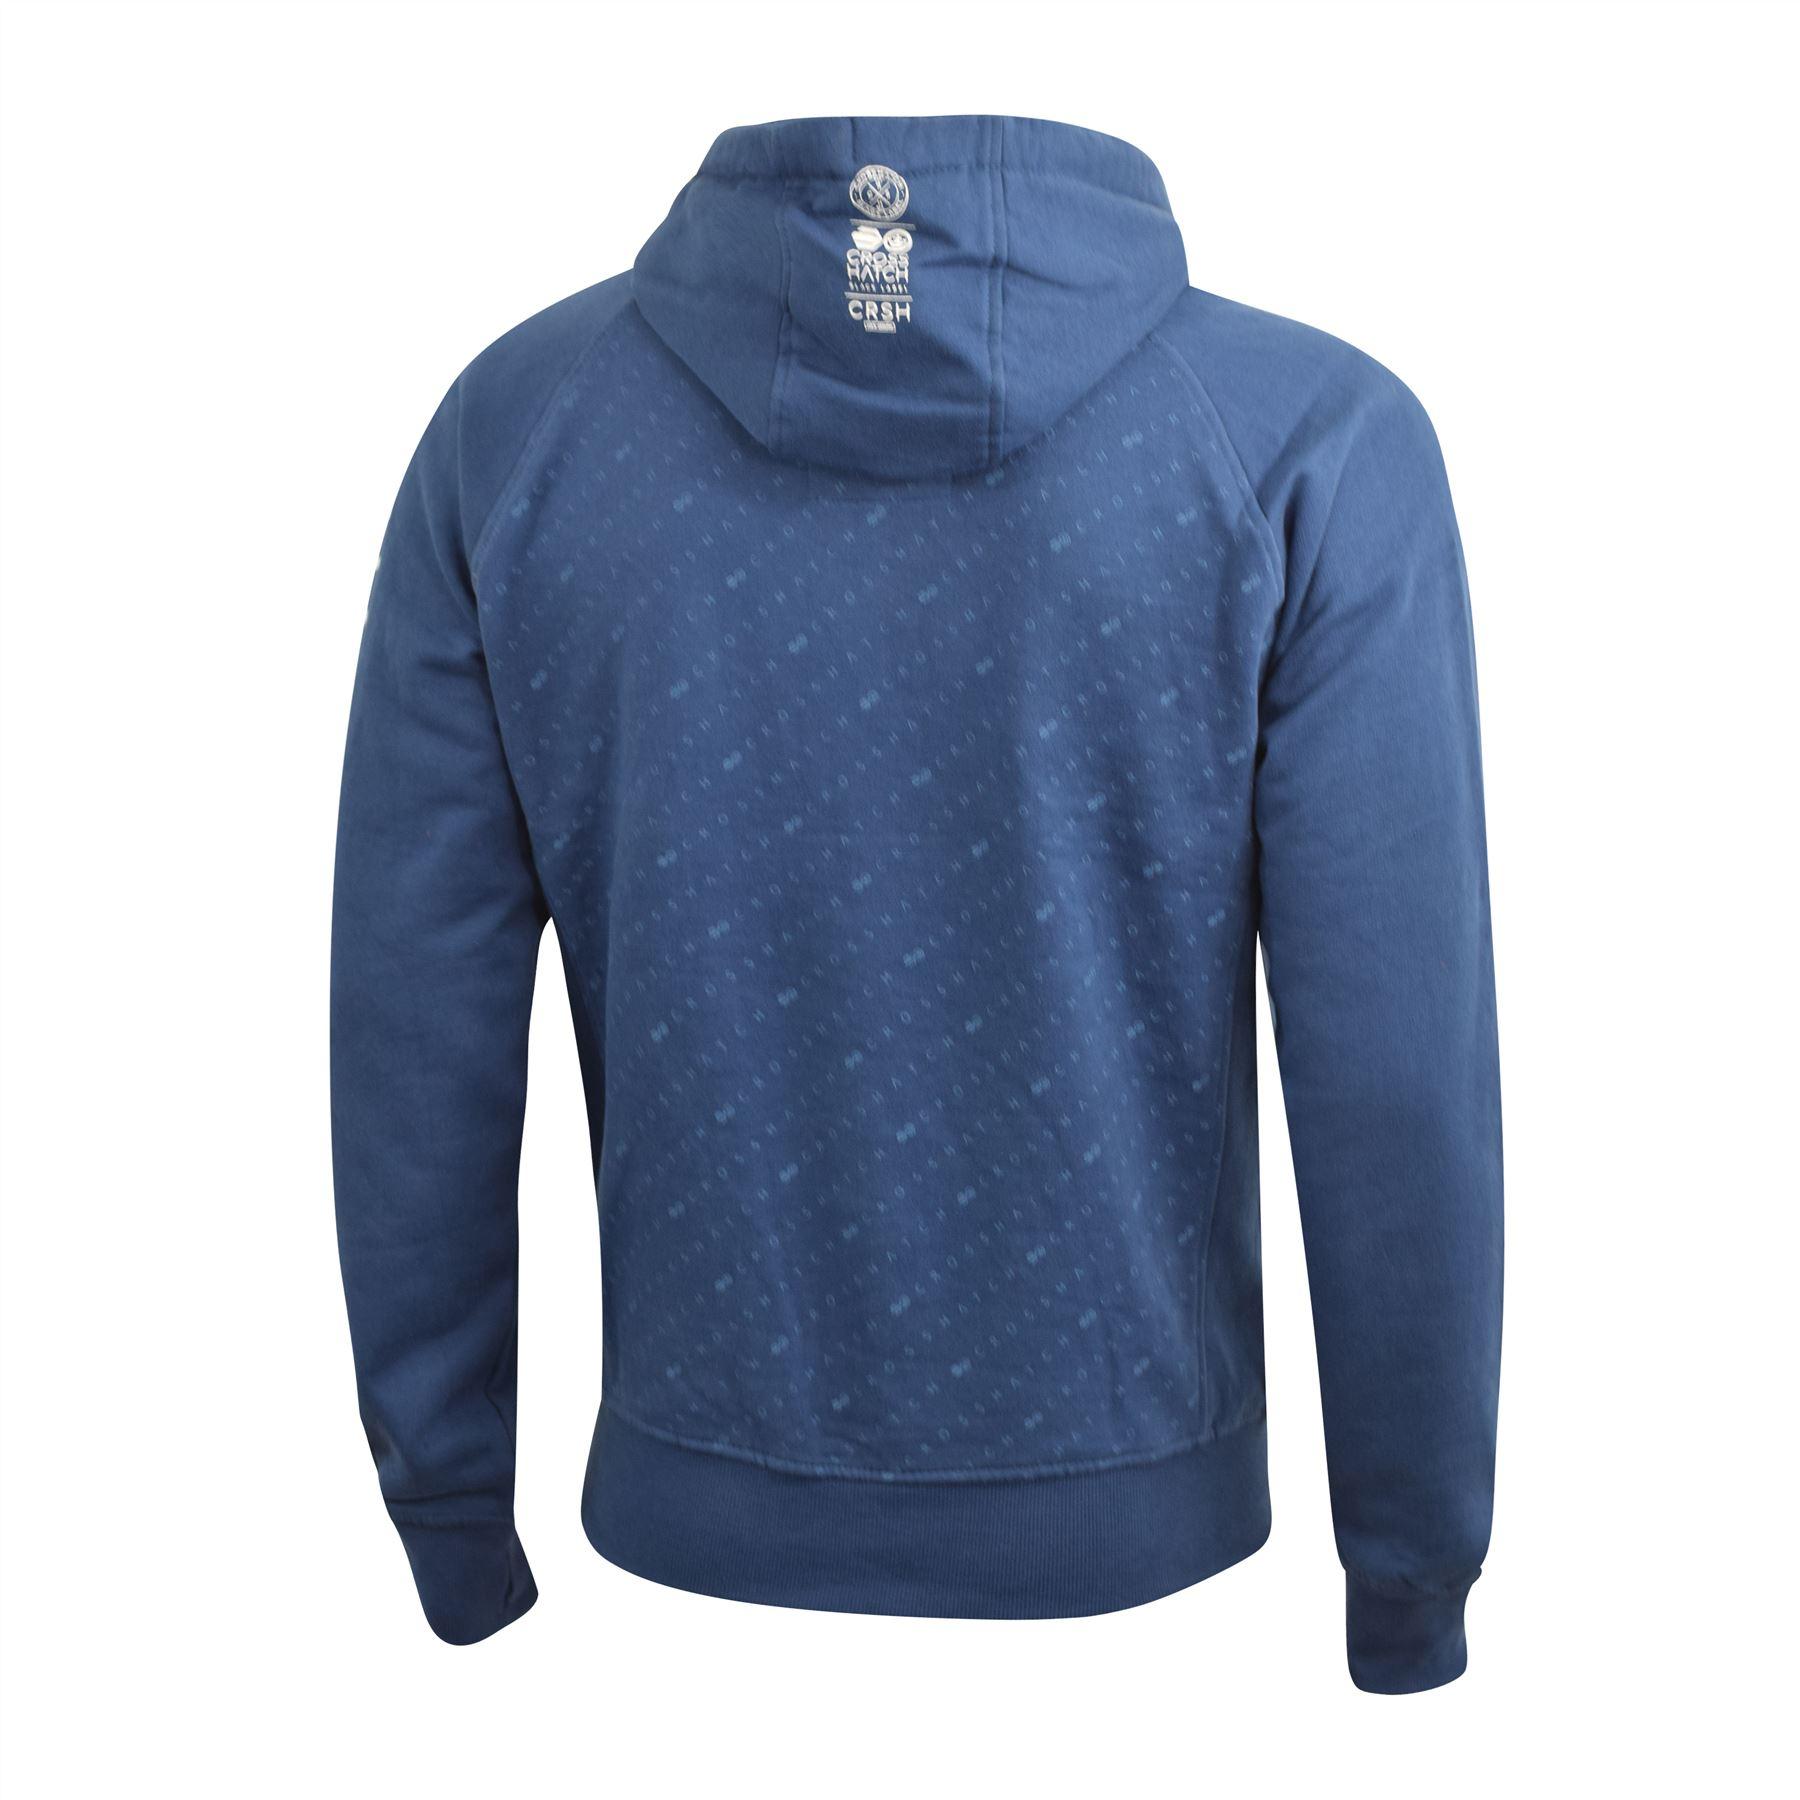 Mens-Hoodie-Crosshatch-Pullover-Degas-Hooded-Sweater-Jumper thumbnail 8